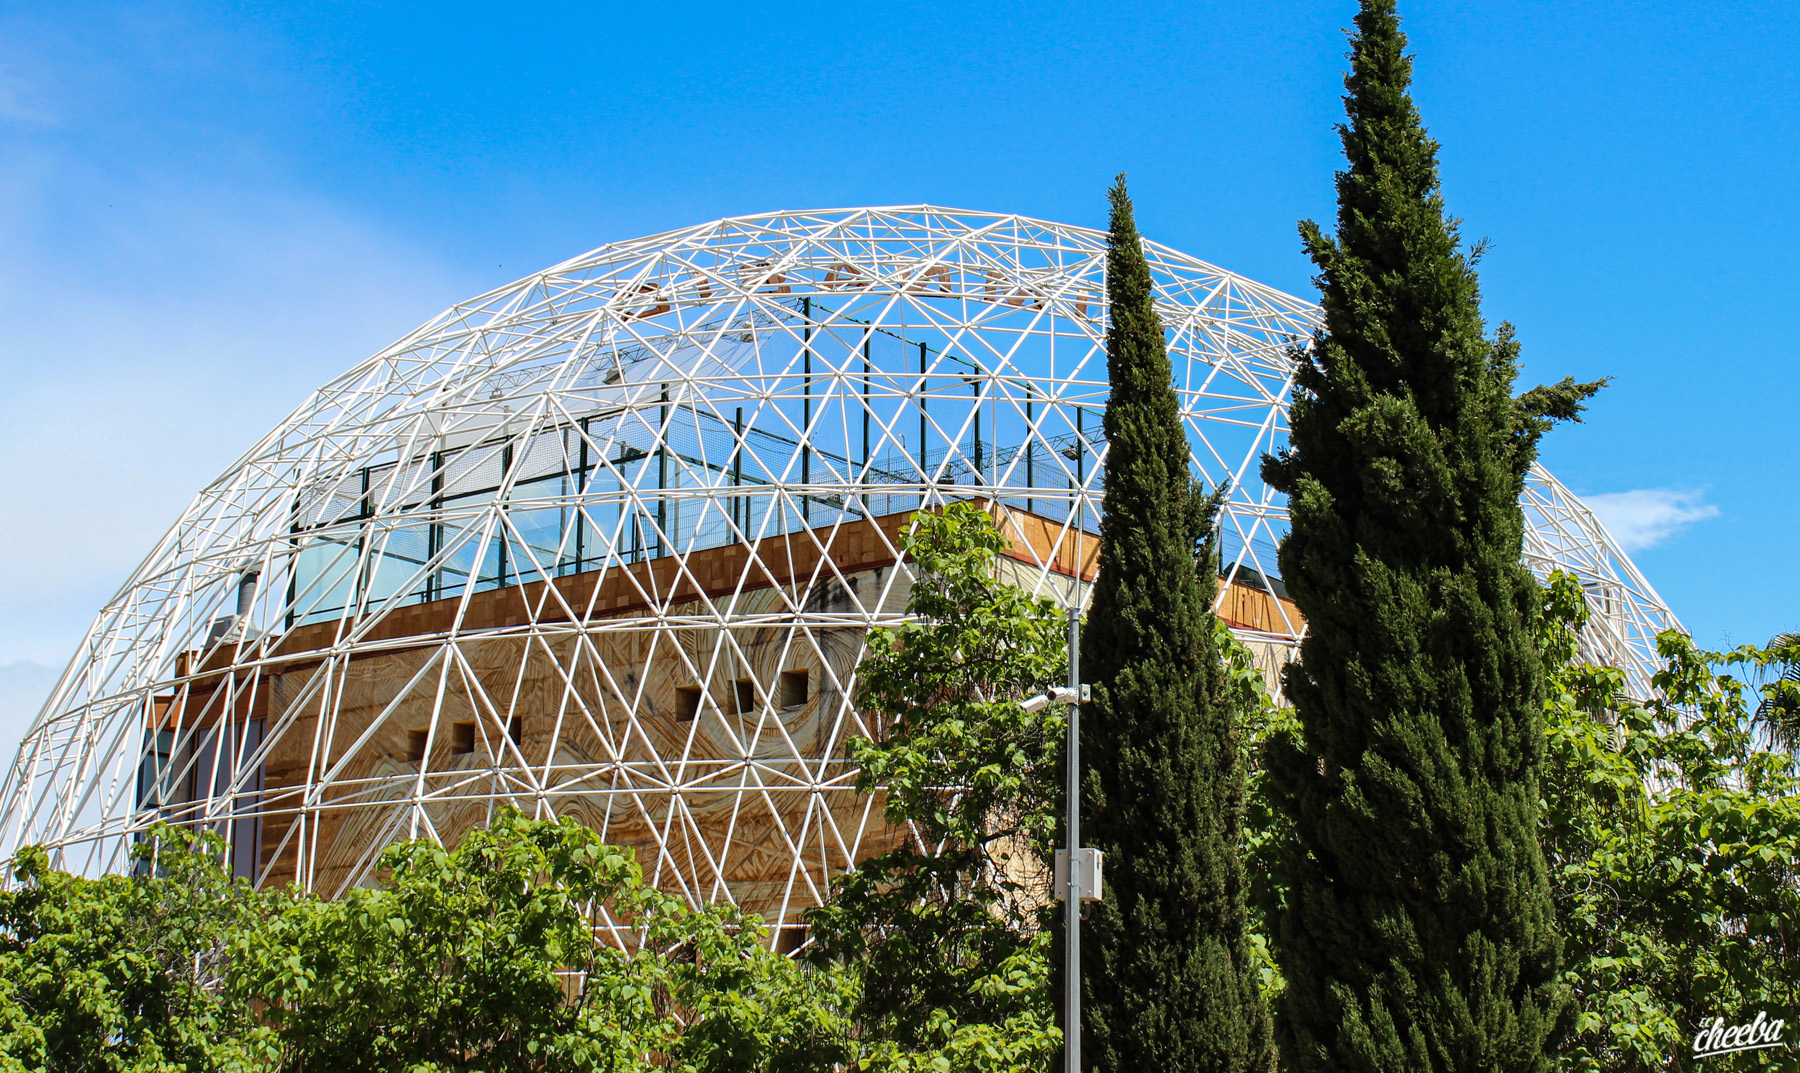 Urbex Expo92 - Expo Universelle à Séville - Urbex Spain by El Cheeba